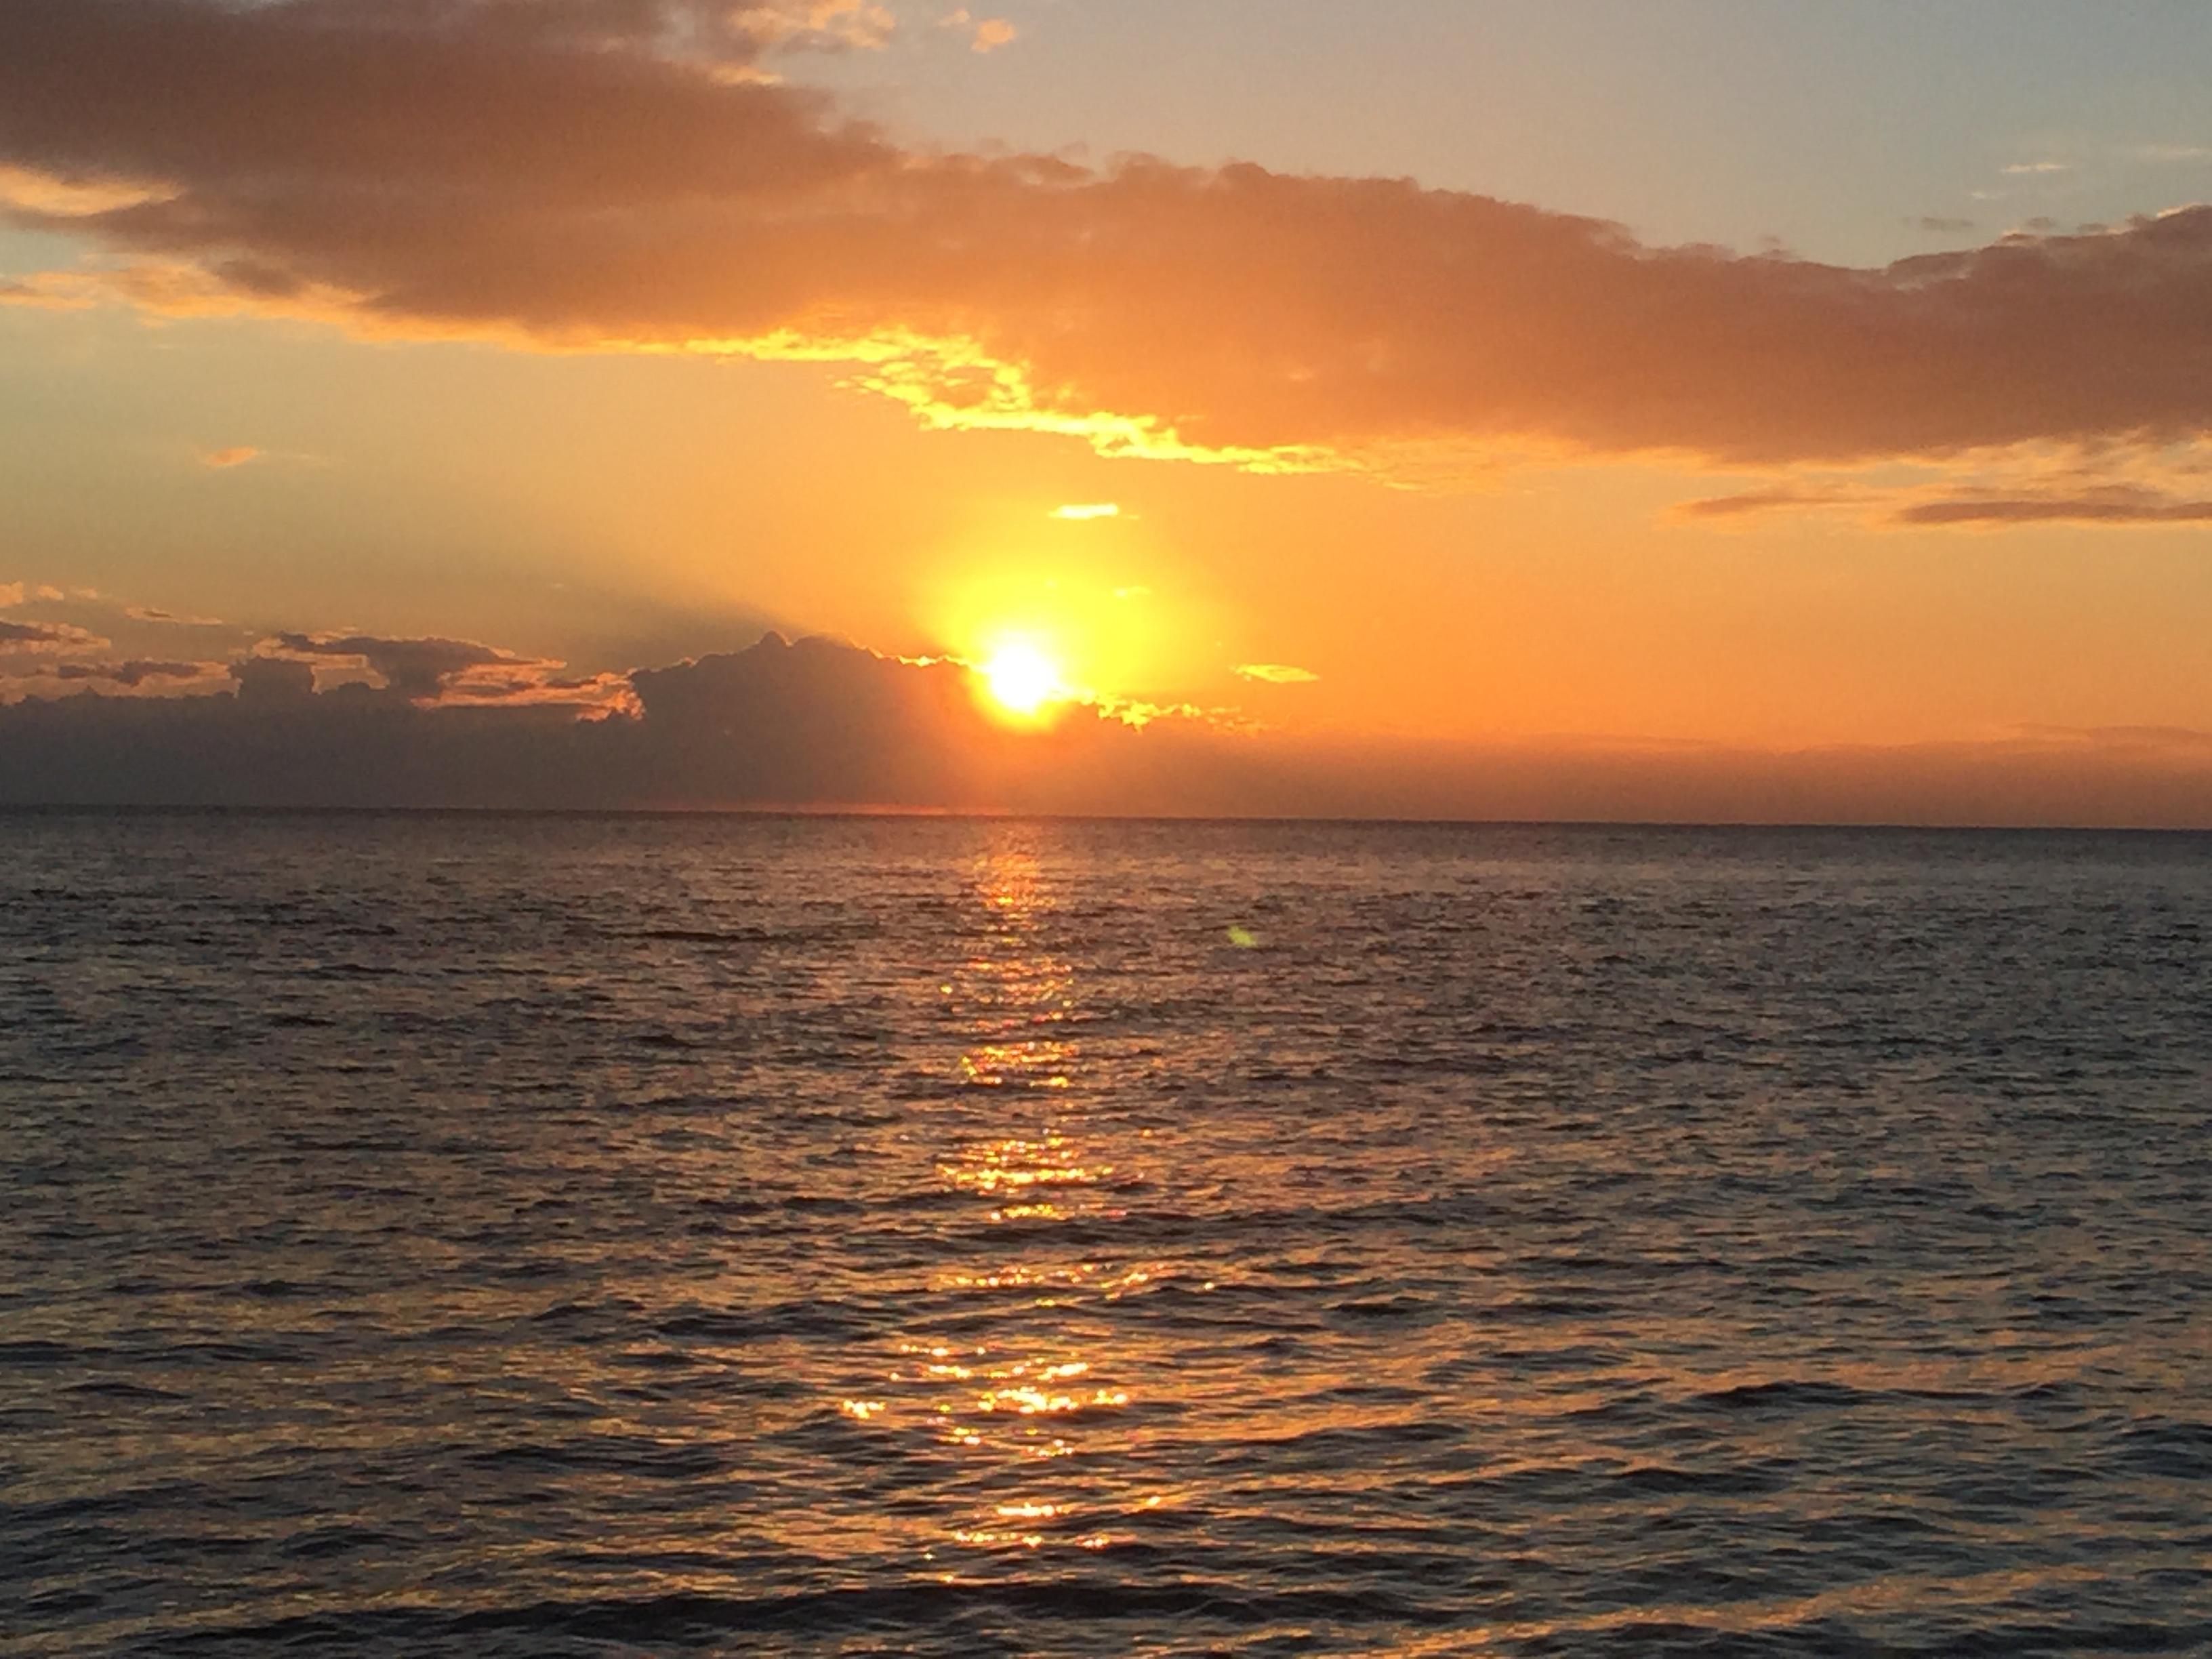 Sunset on Hauraki Gulf